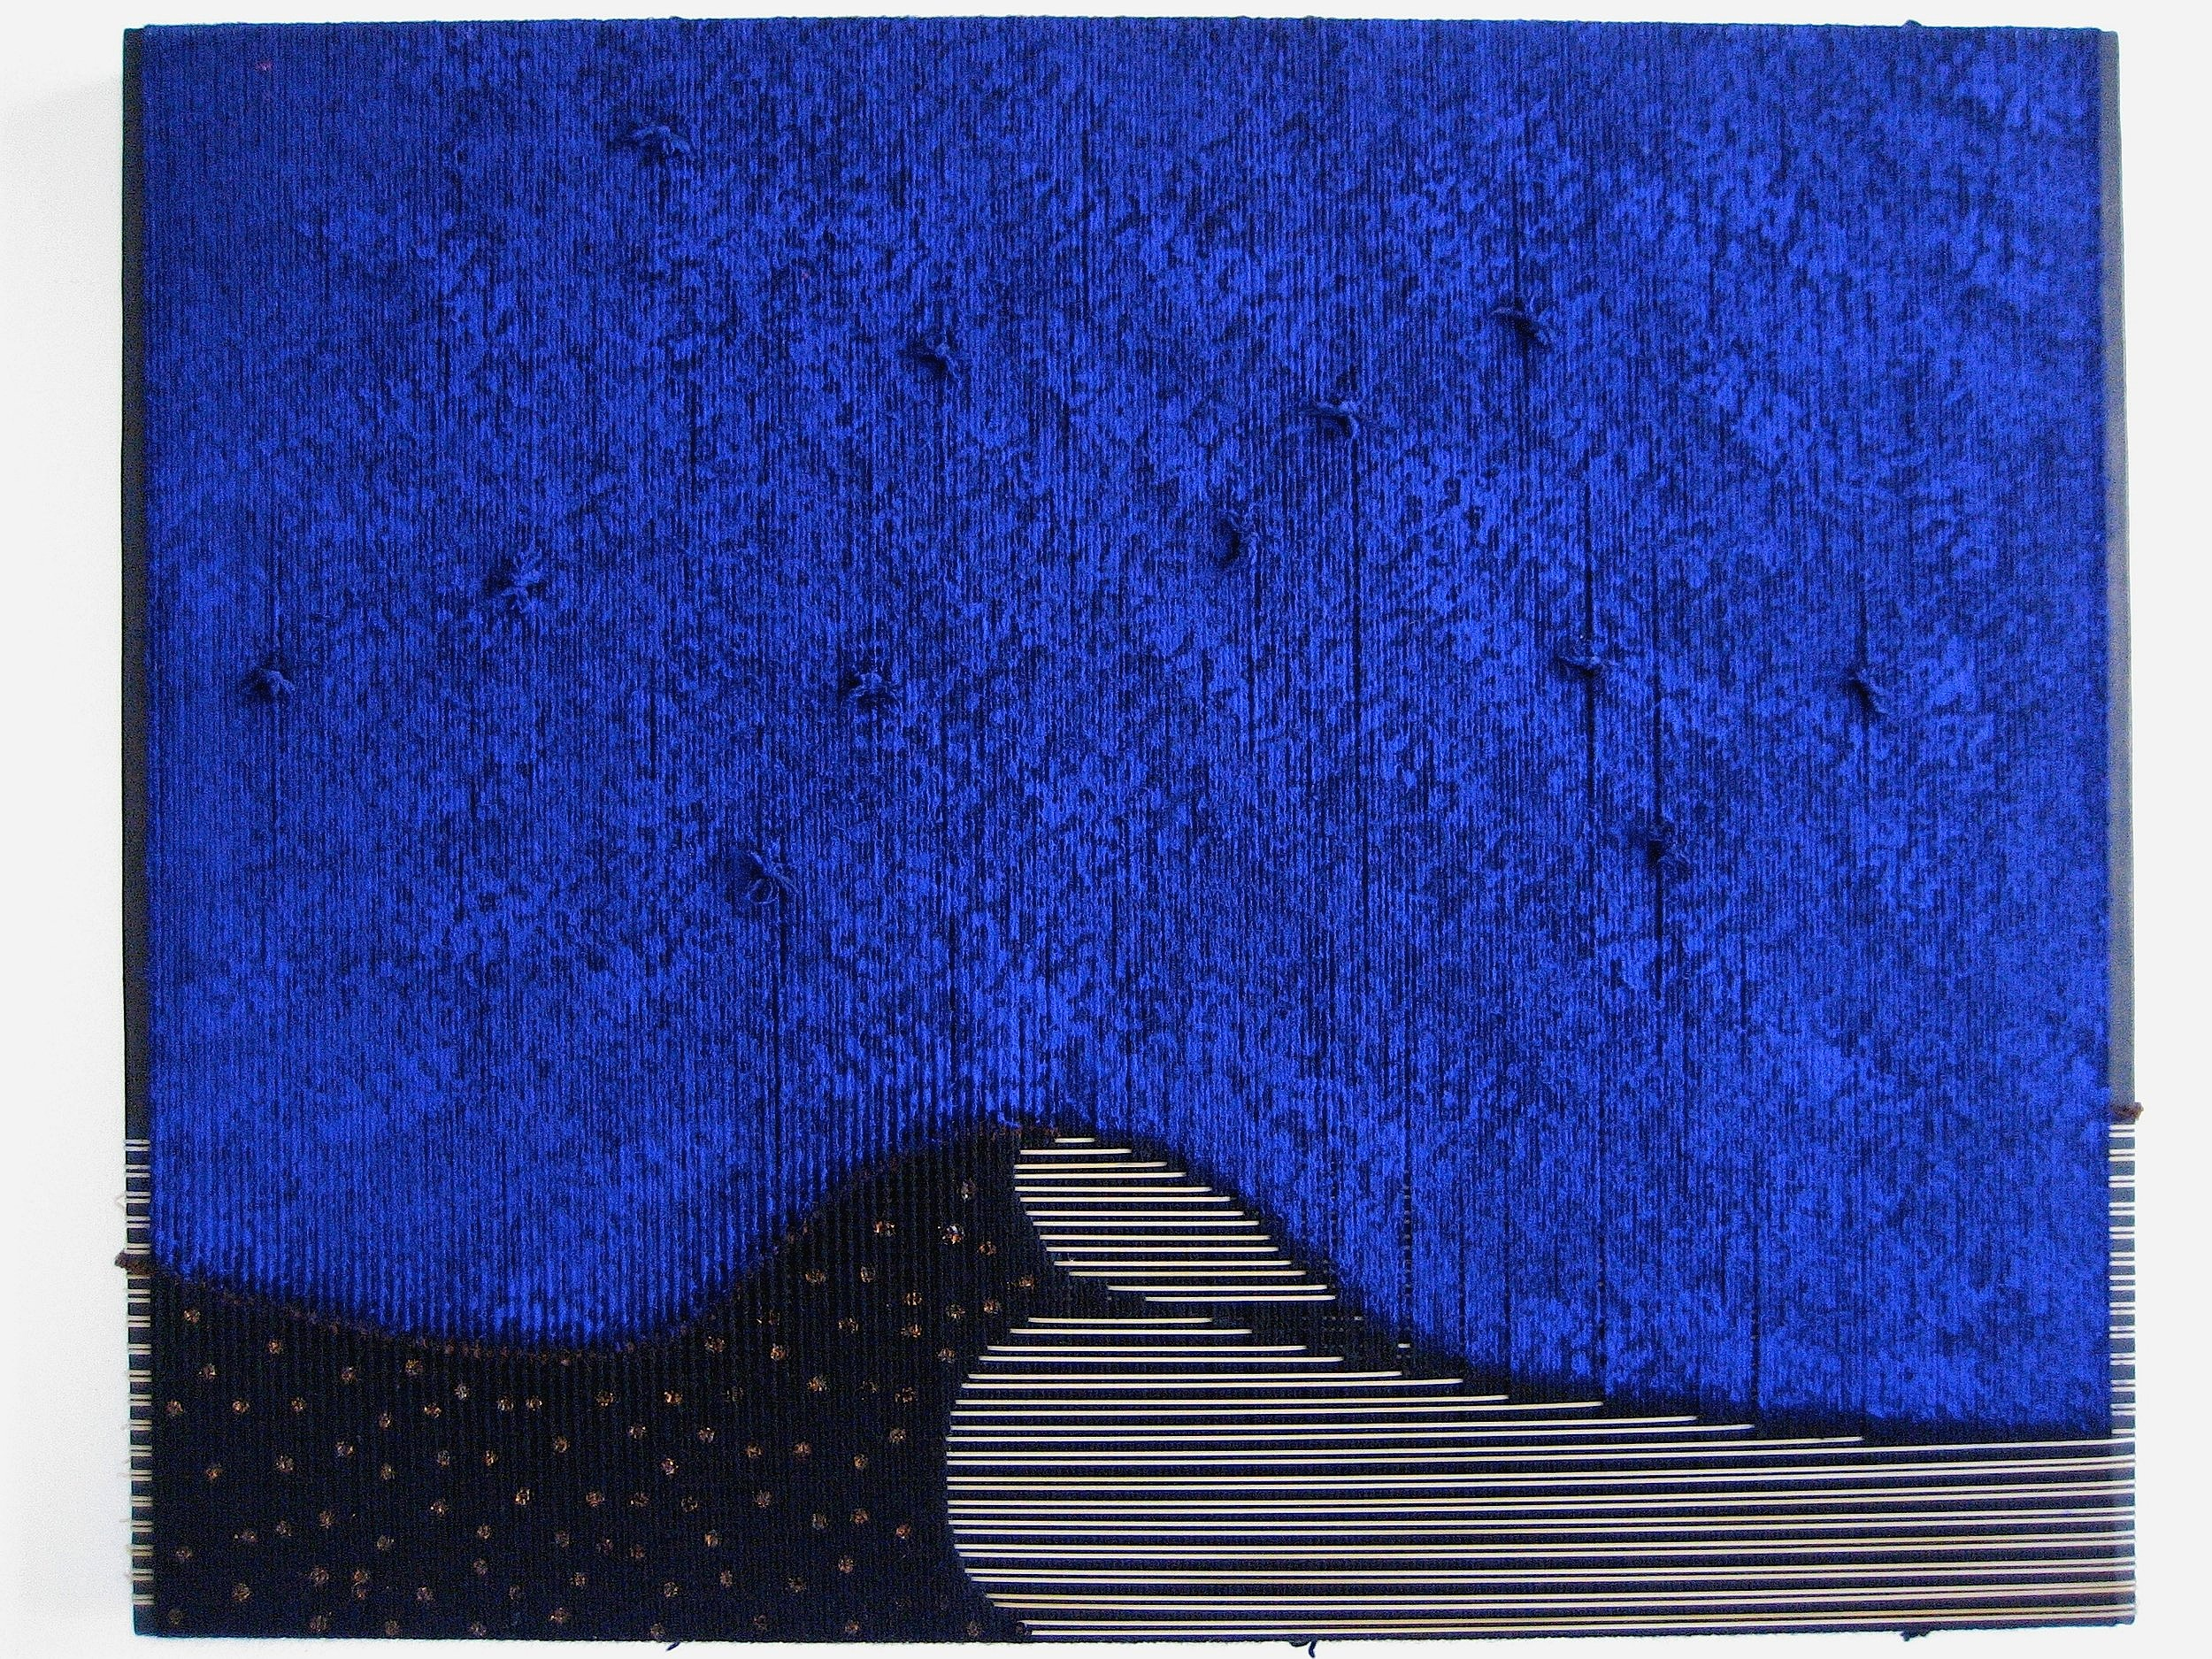 la stella riposa  2008  wool, pvc, acrylic  31 x 39 in.